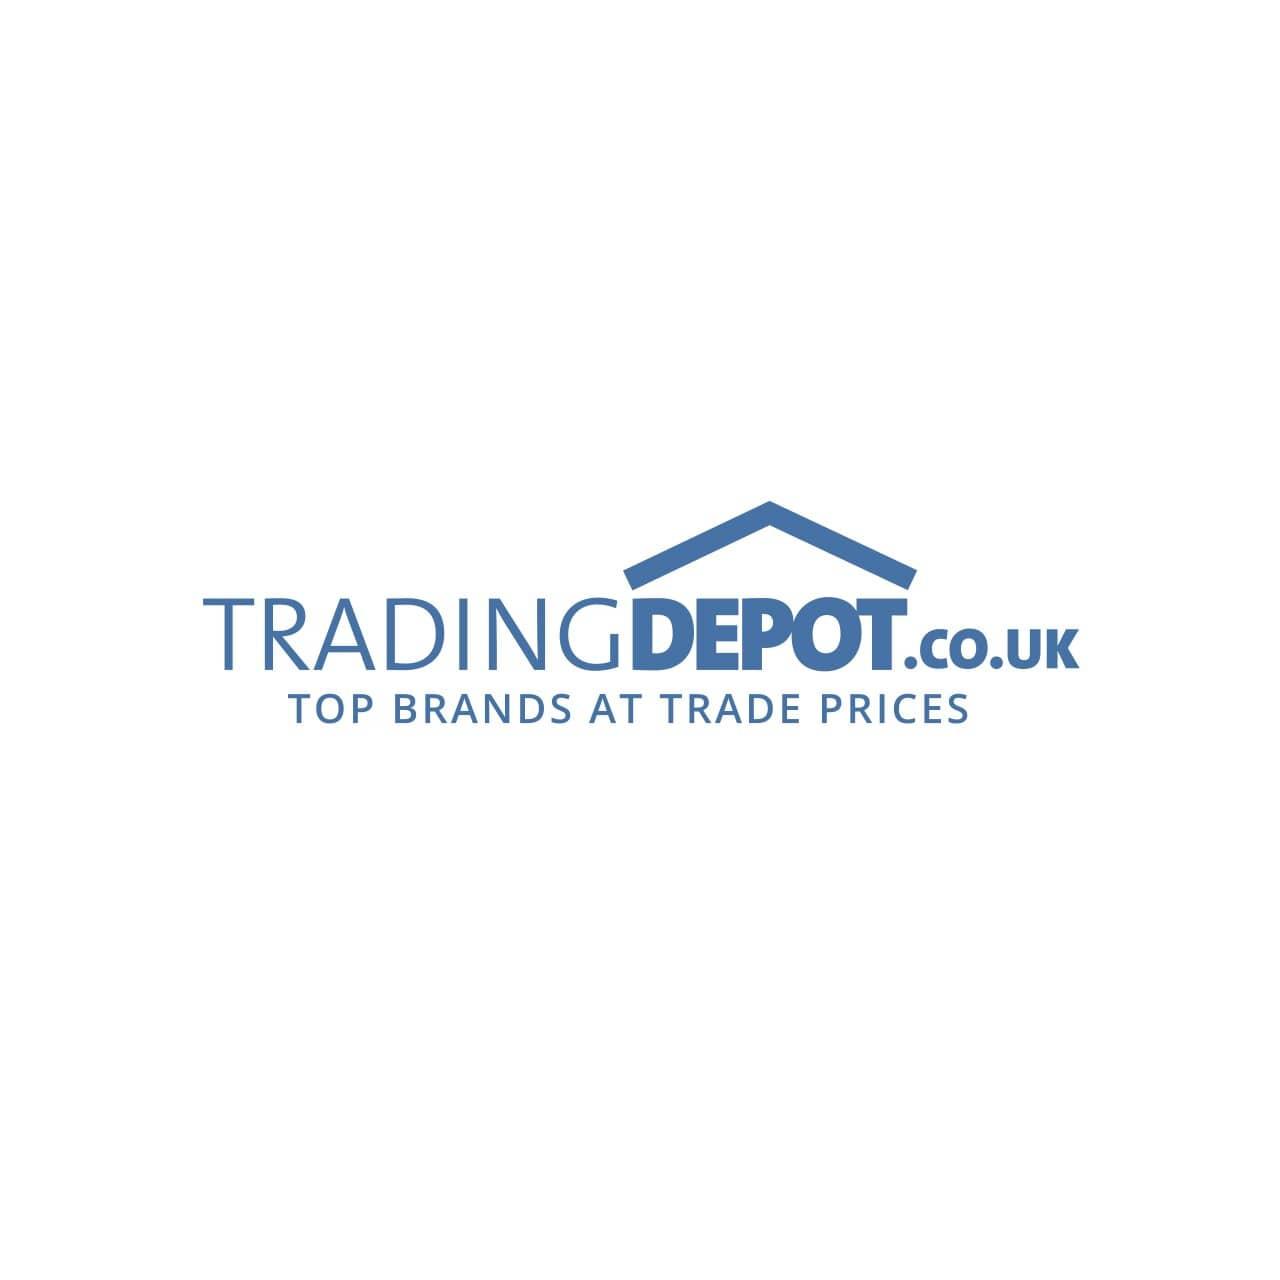 LPD Chigwell Clear Glazed Hardwood M&T Door 813x2032x44mm - MTCHICGDG32